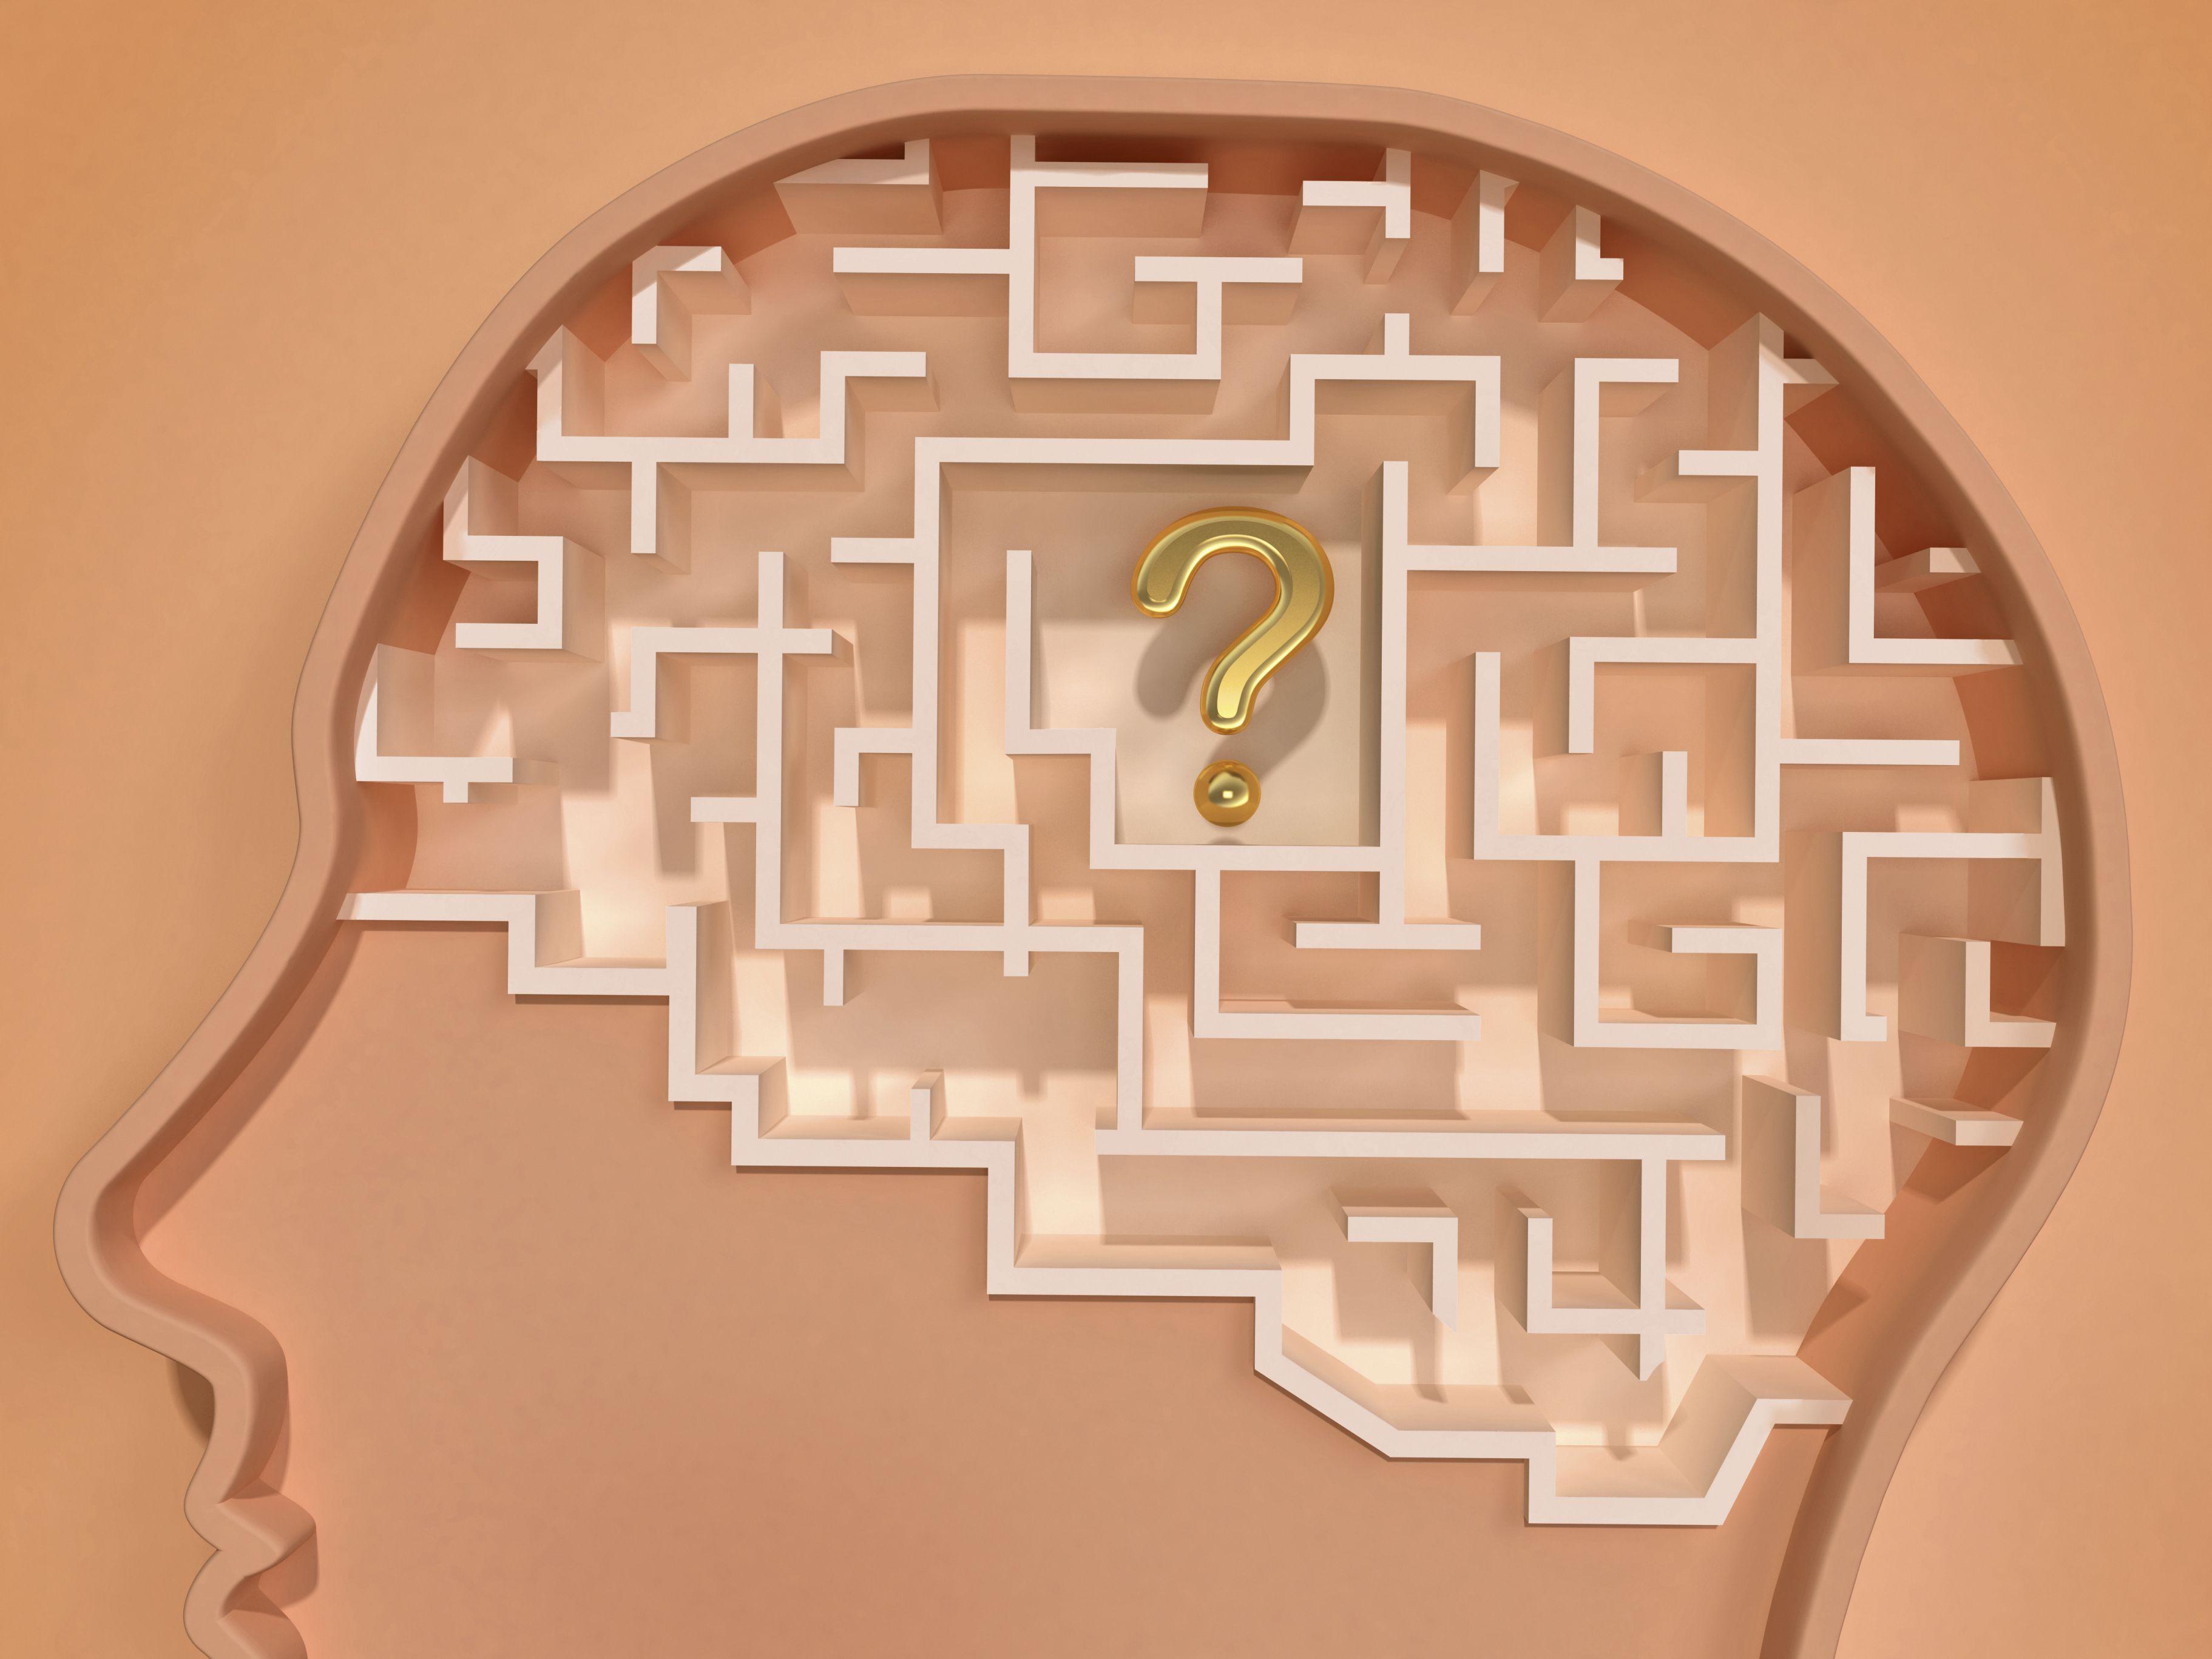 Memory Types Sensory Short Term Working Amp Long Term